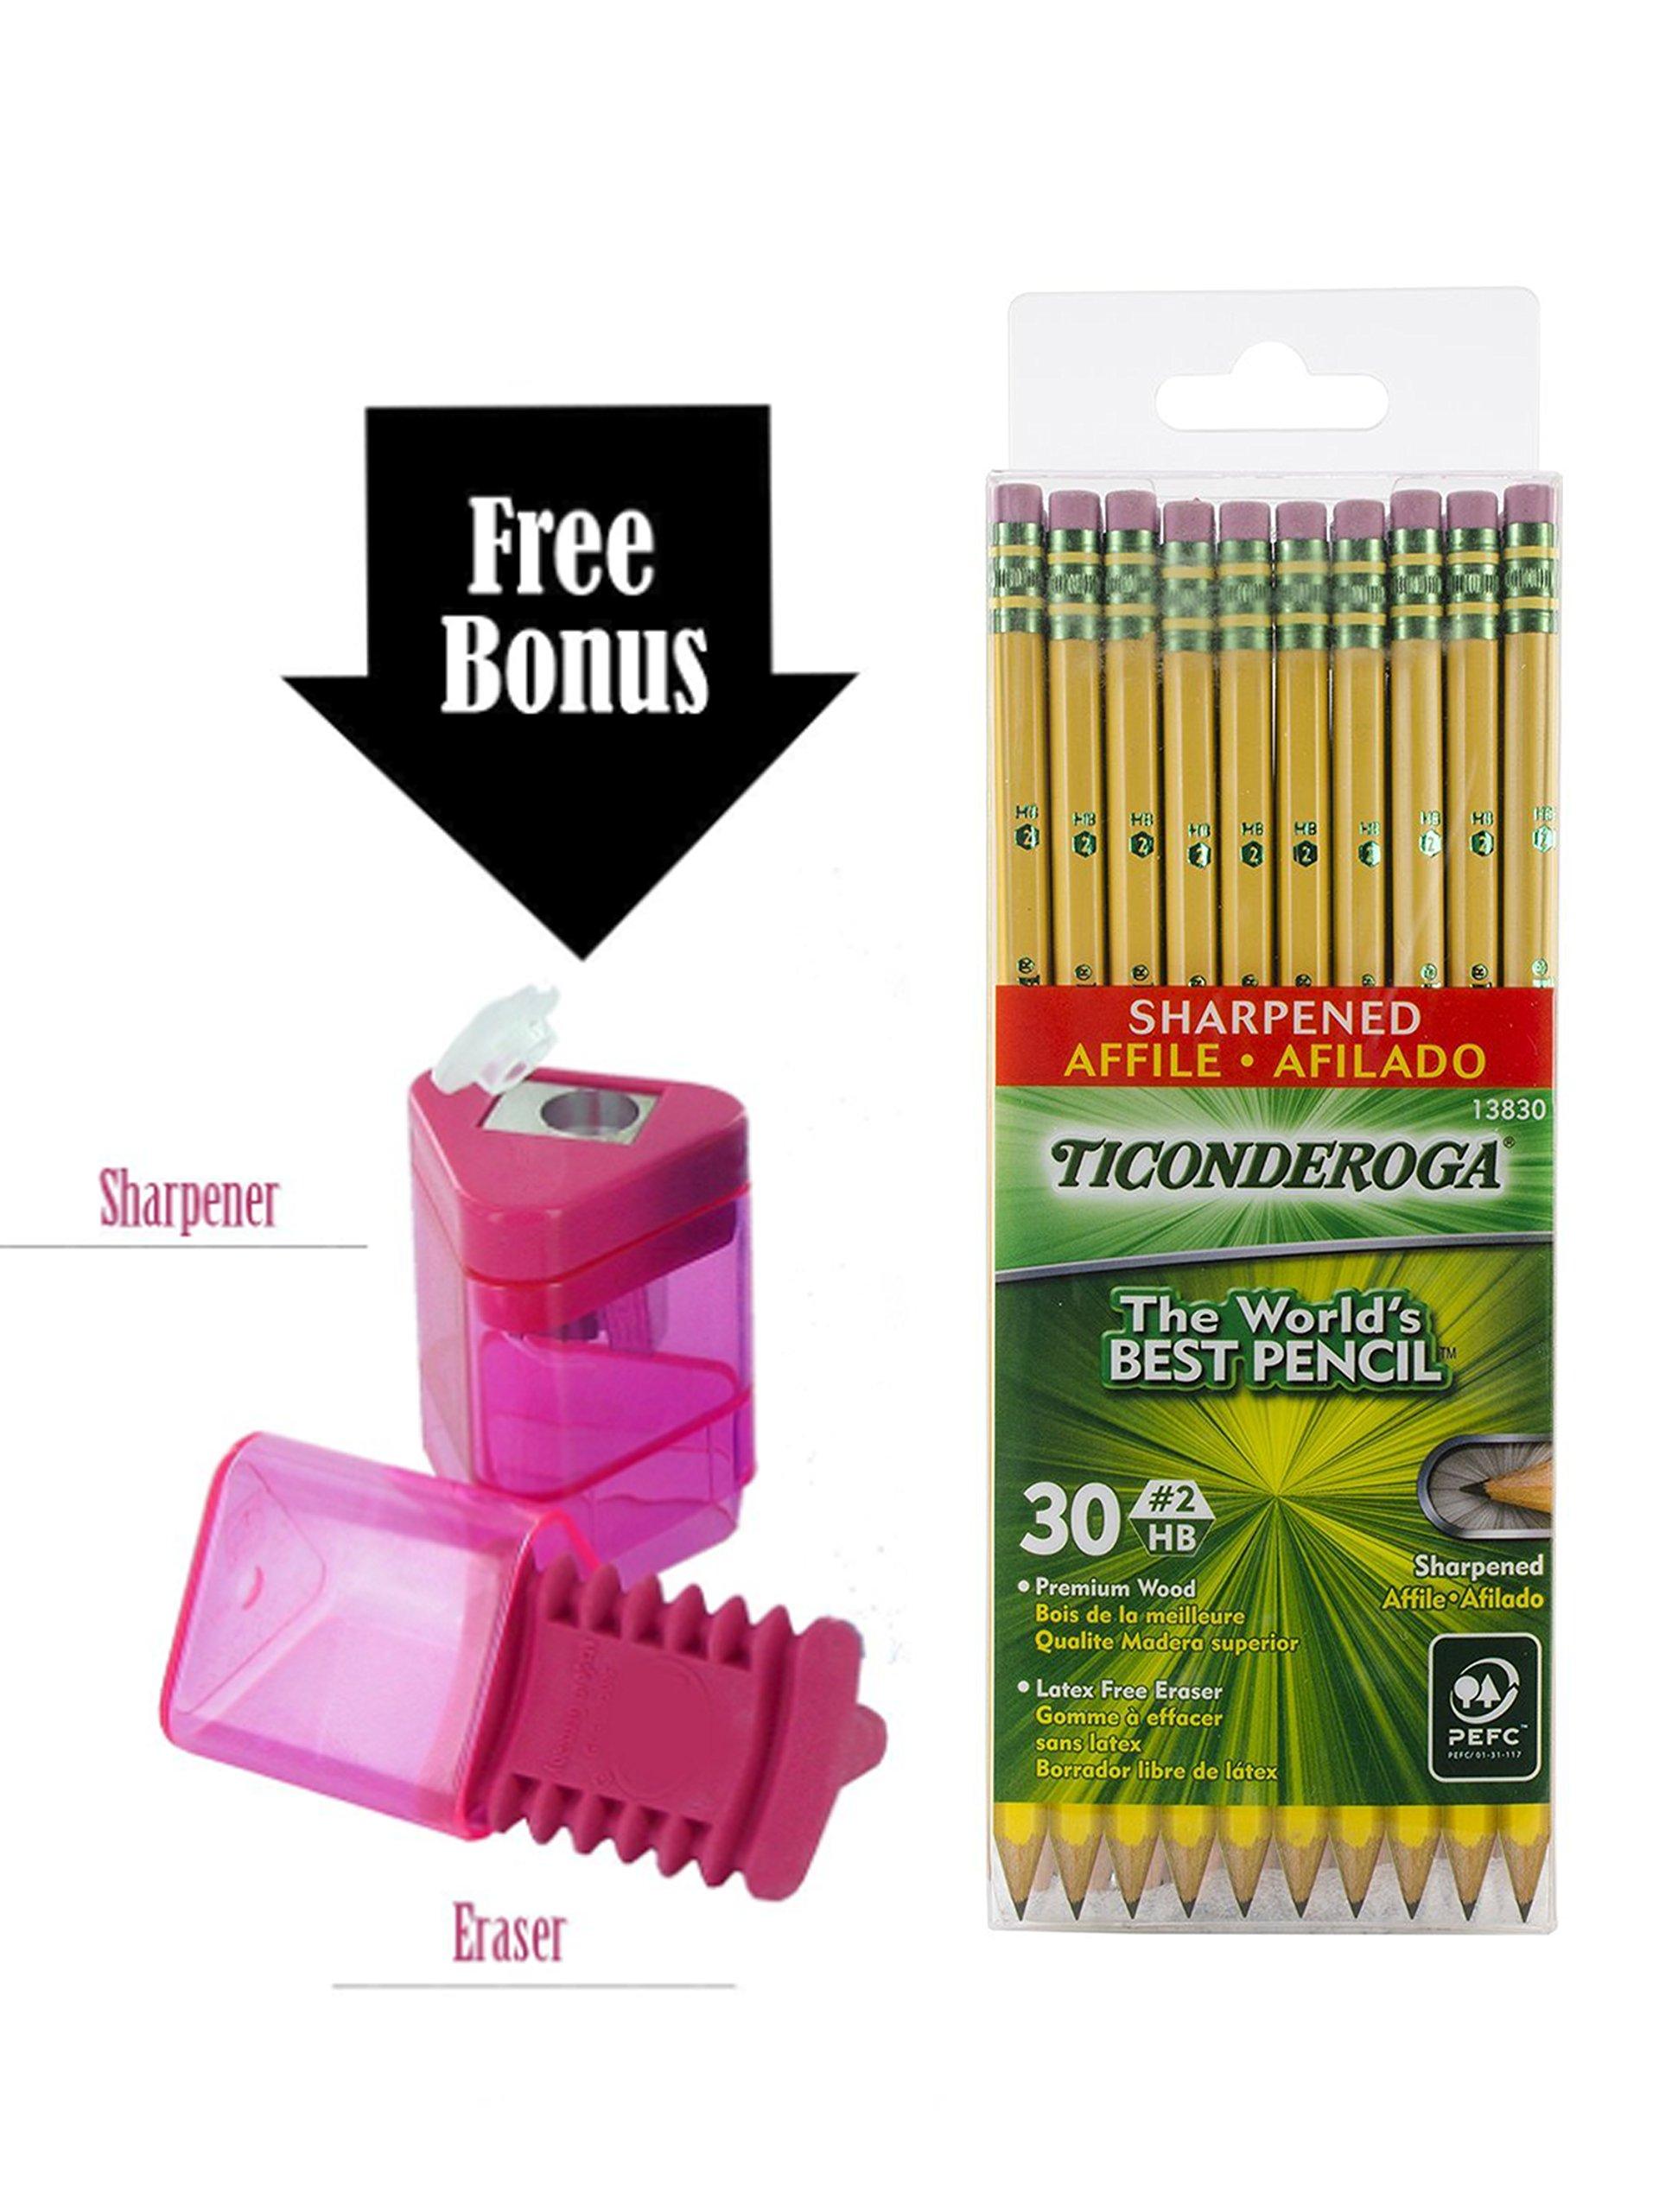 Dixon Ticonderoga Wood-Cased Pencils, 2 HB, Yellow, Box of 30, Including FREE BONUS 1 Hole Sharpener-Eraser Combo, (Colors may vary)